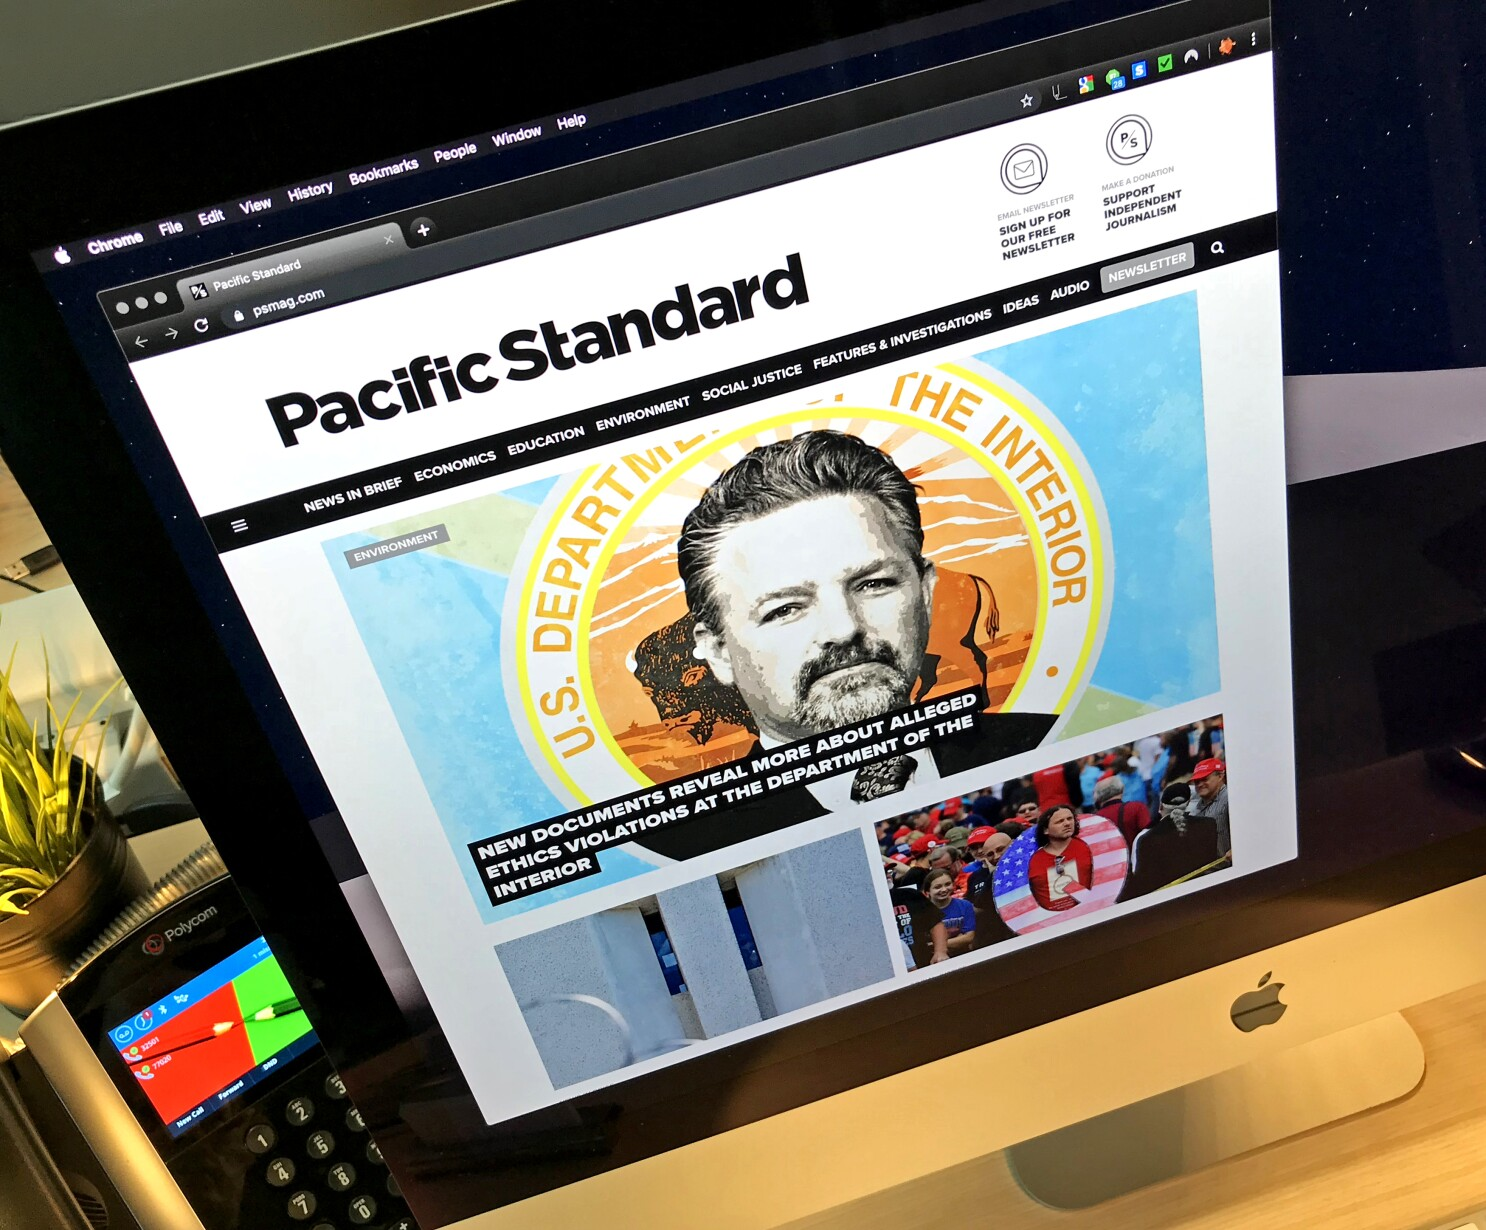 Pacific Standard magazine is shutting down